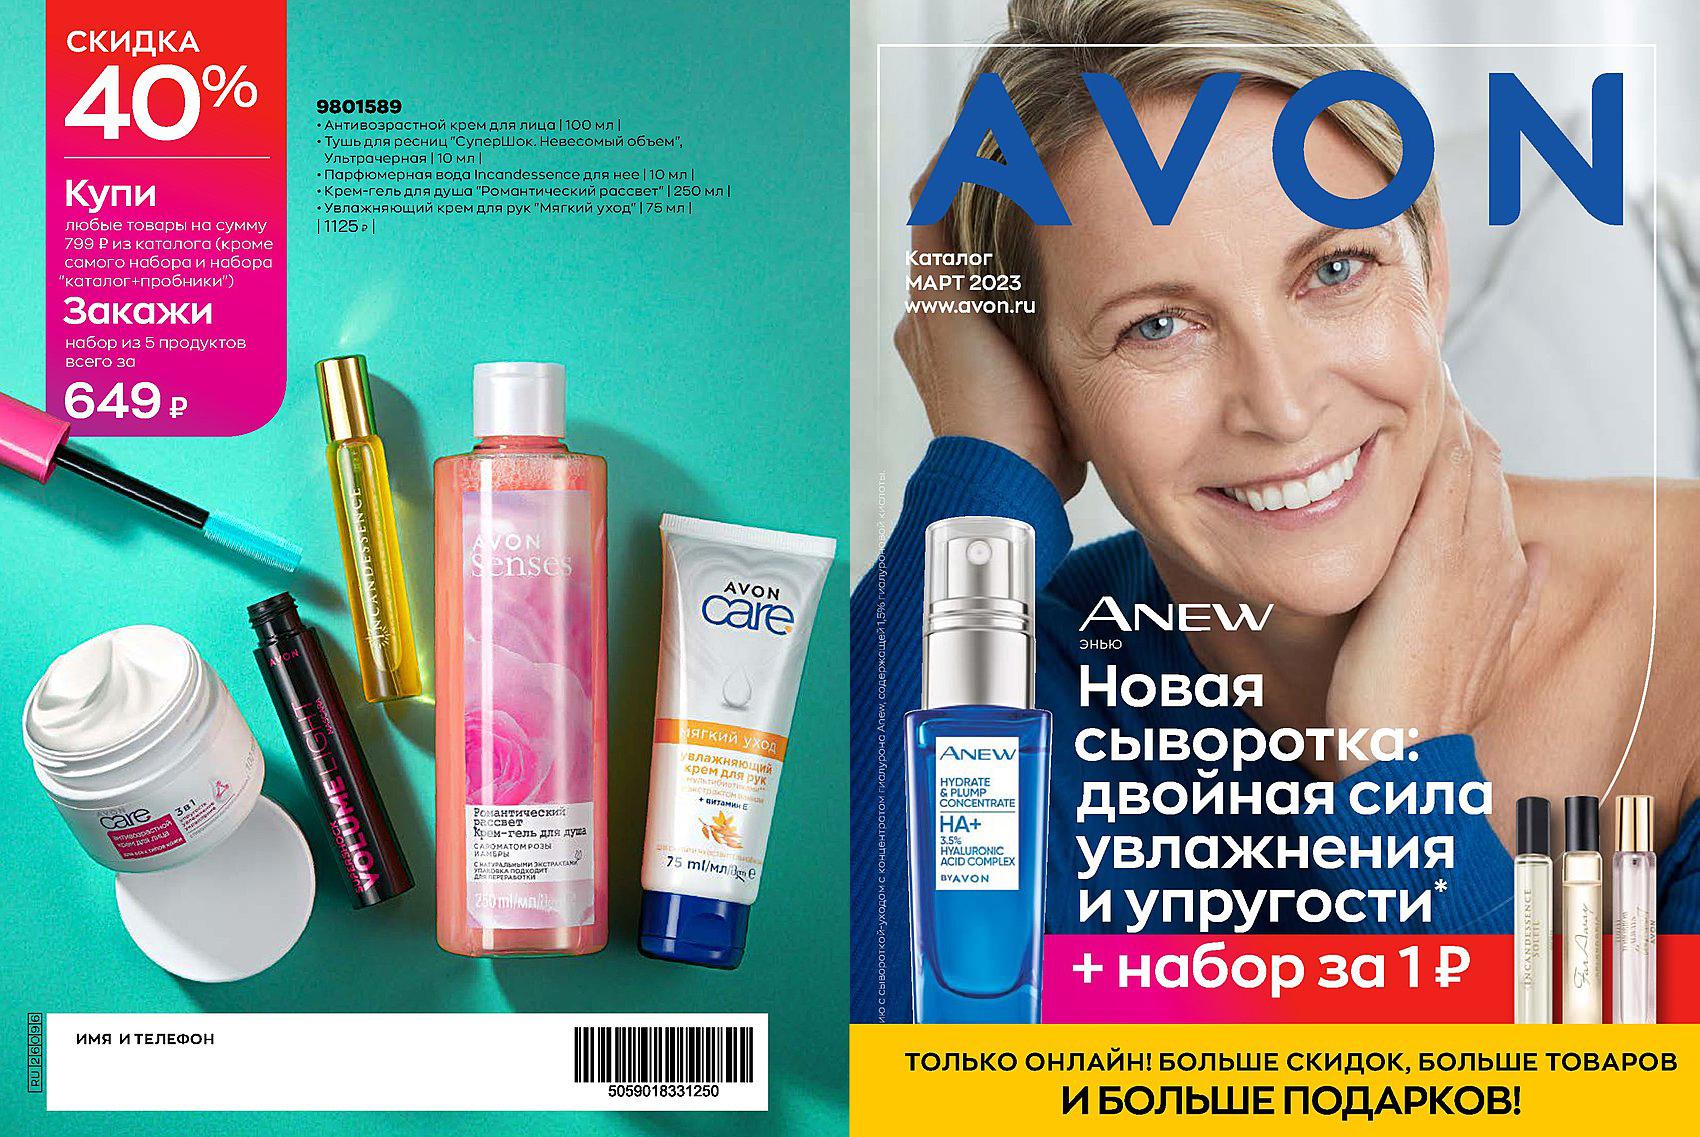 Avon онлайн каталог 2021 косметика биолоджик решерш купить в москве